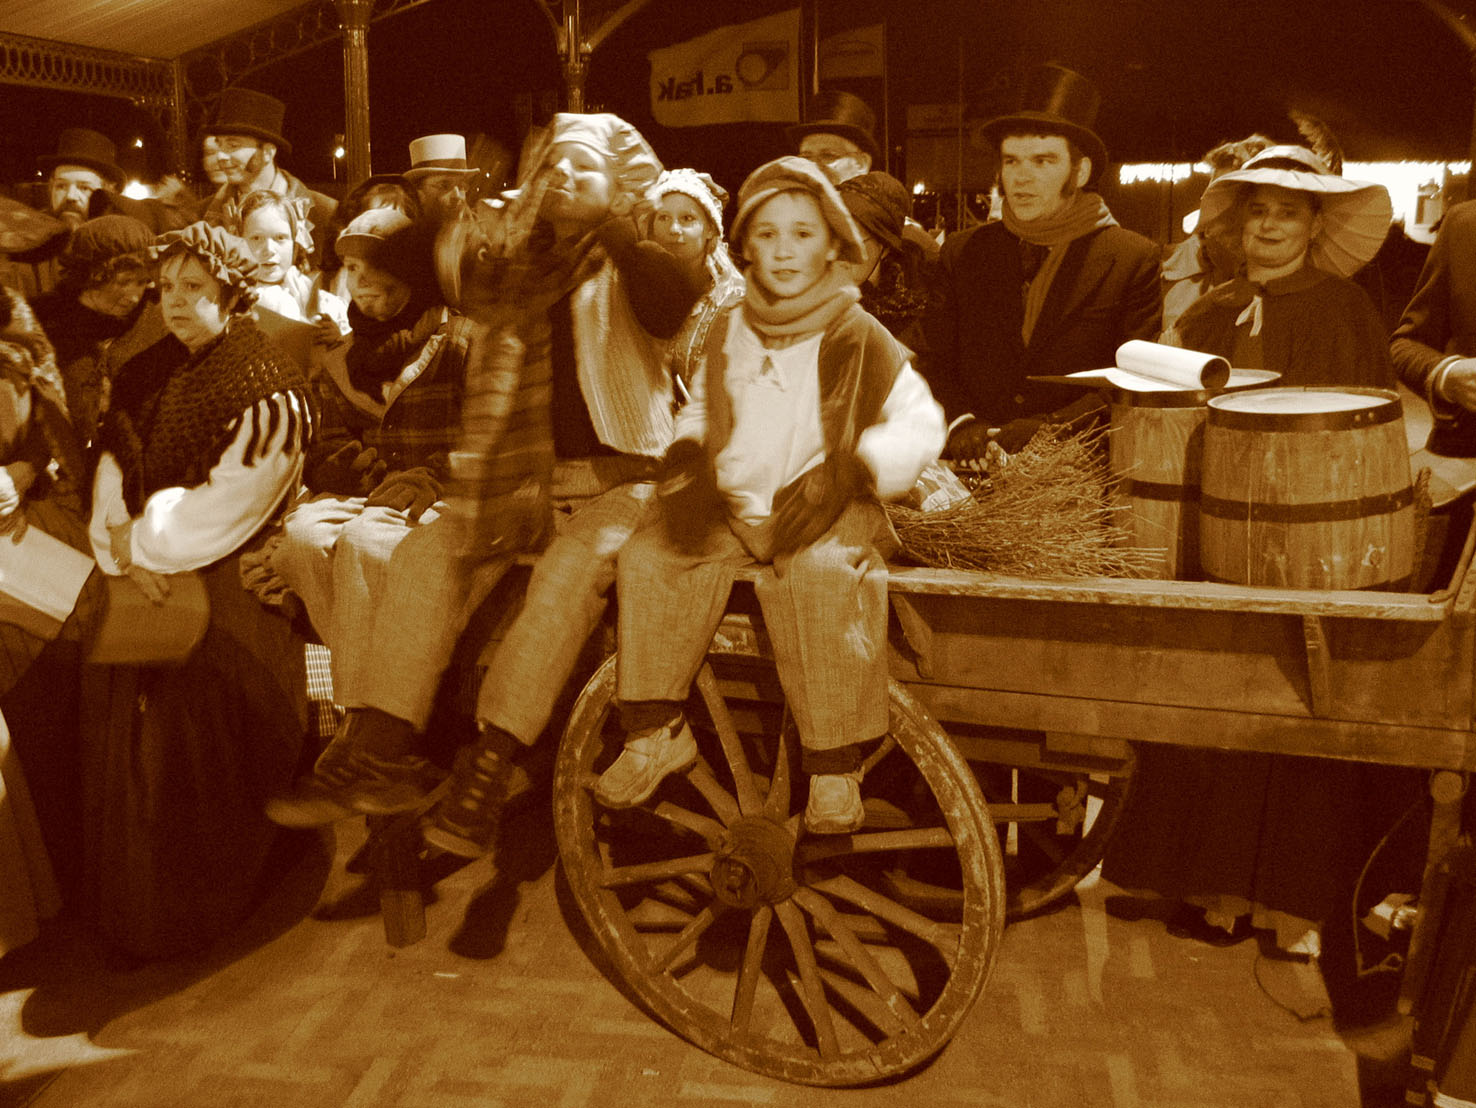 117 - Kerstmarkt Helmond 2003.jpg